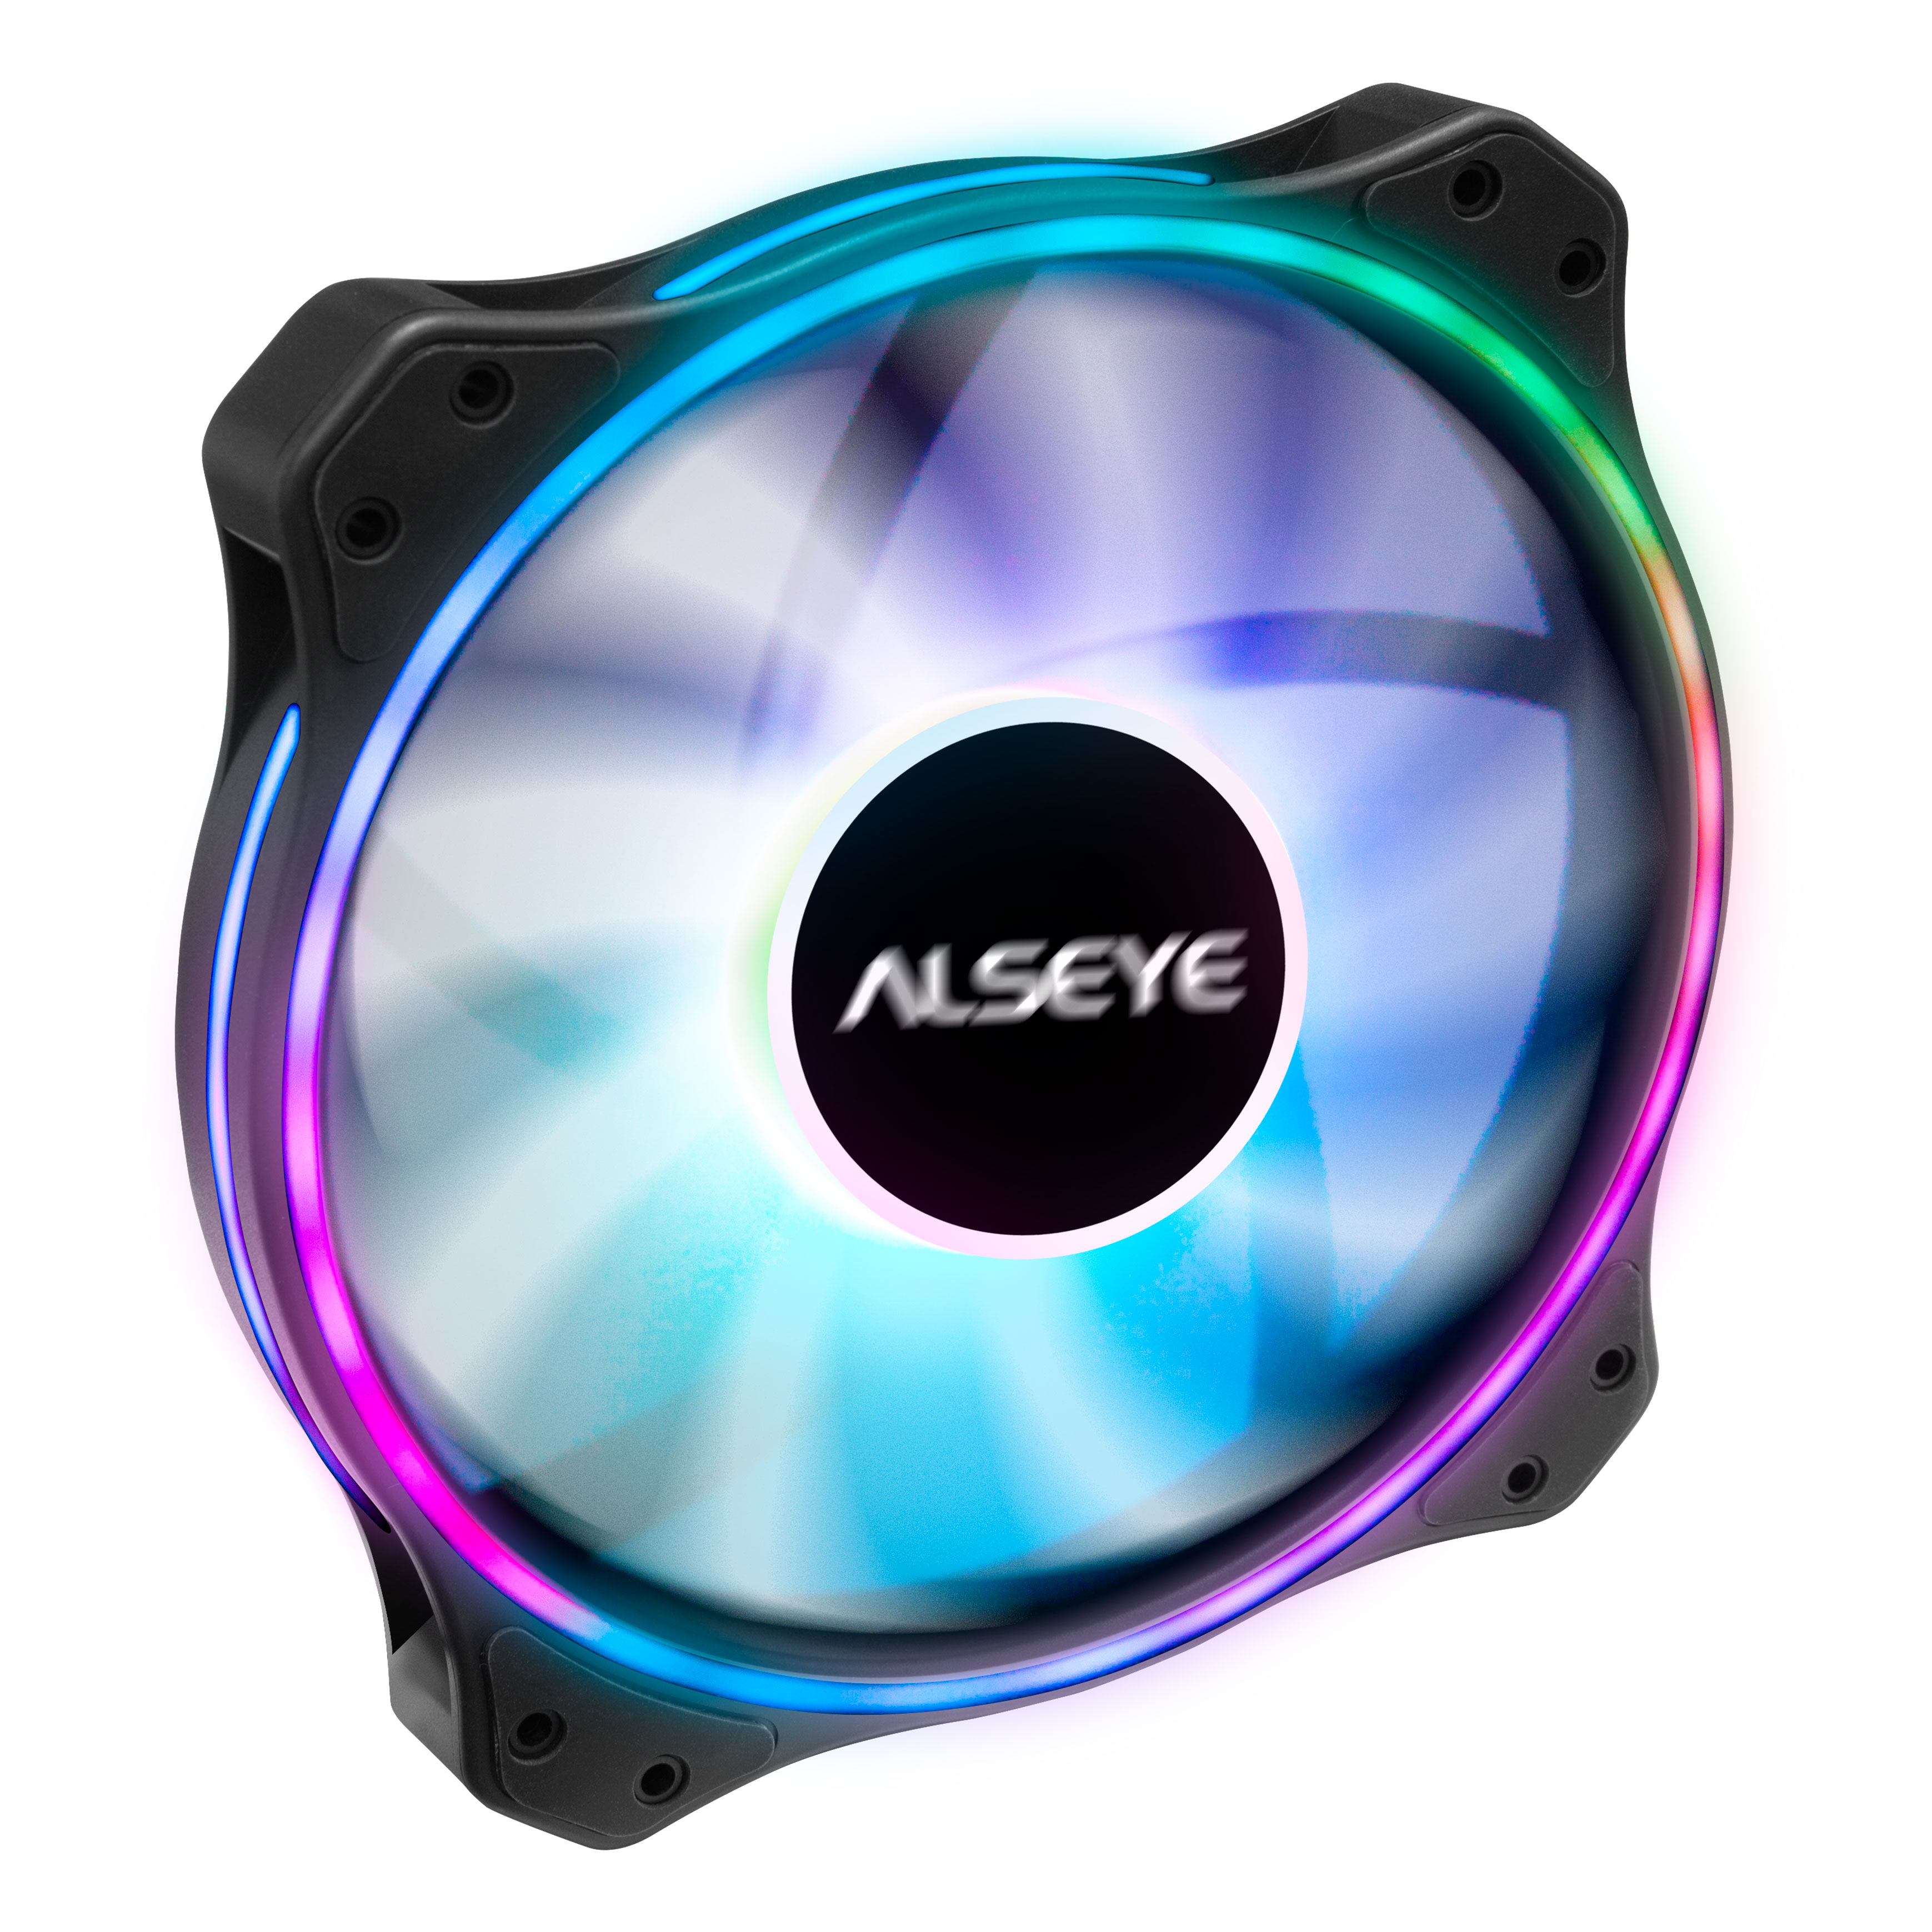 ALSEYE AURO Series 200mm ARGB LED Computer Case Cooling Fan 4pin PWM Remote Control RGB Lighting